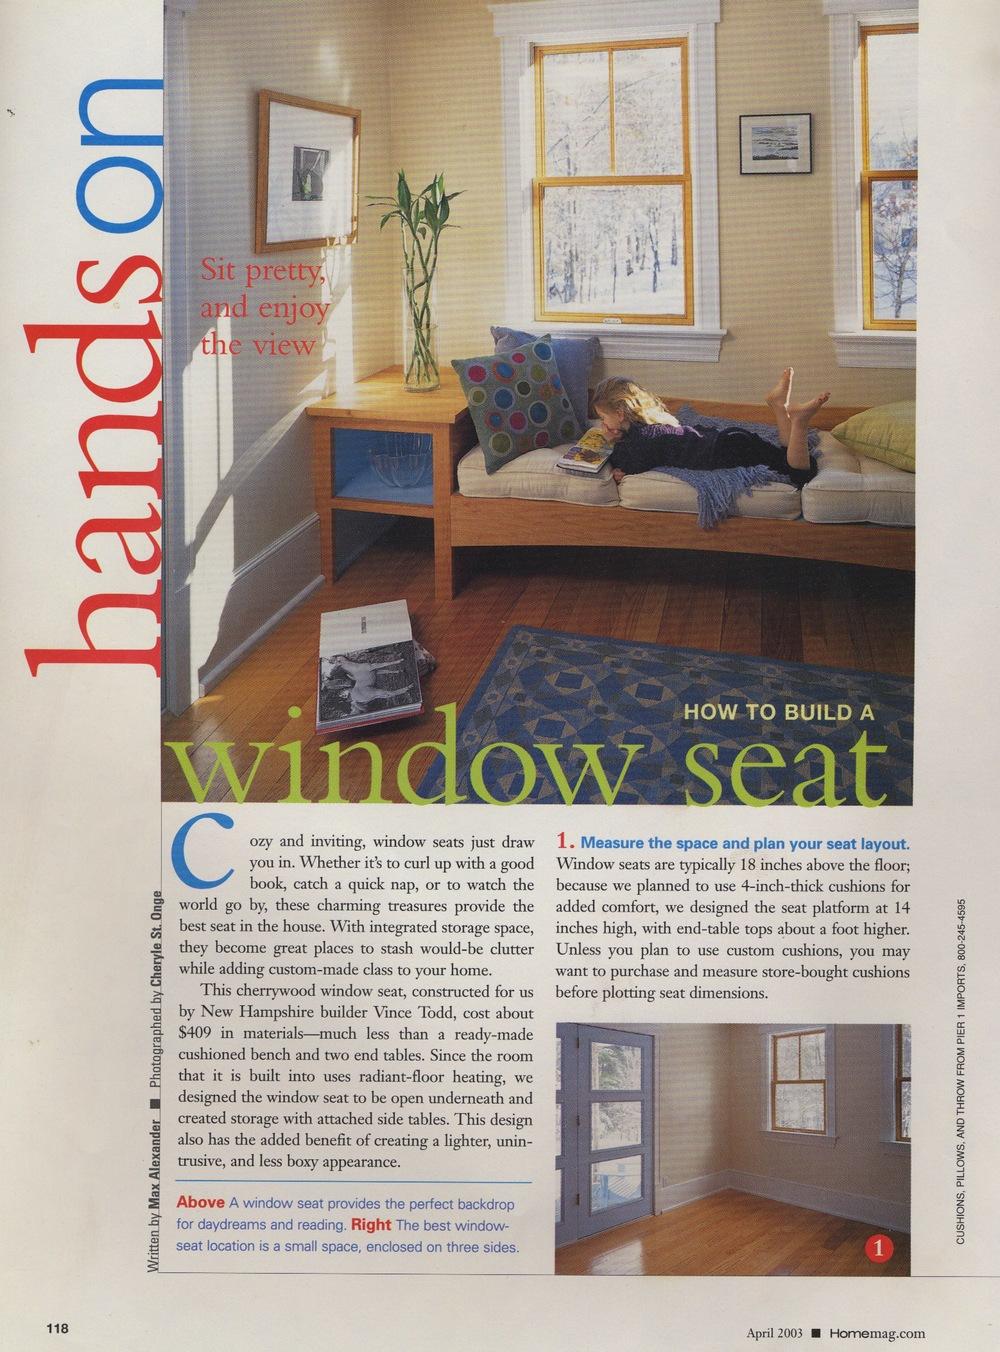 Home Magazine - Window Seat - Story.jpg